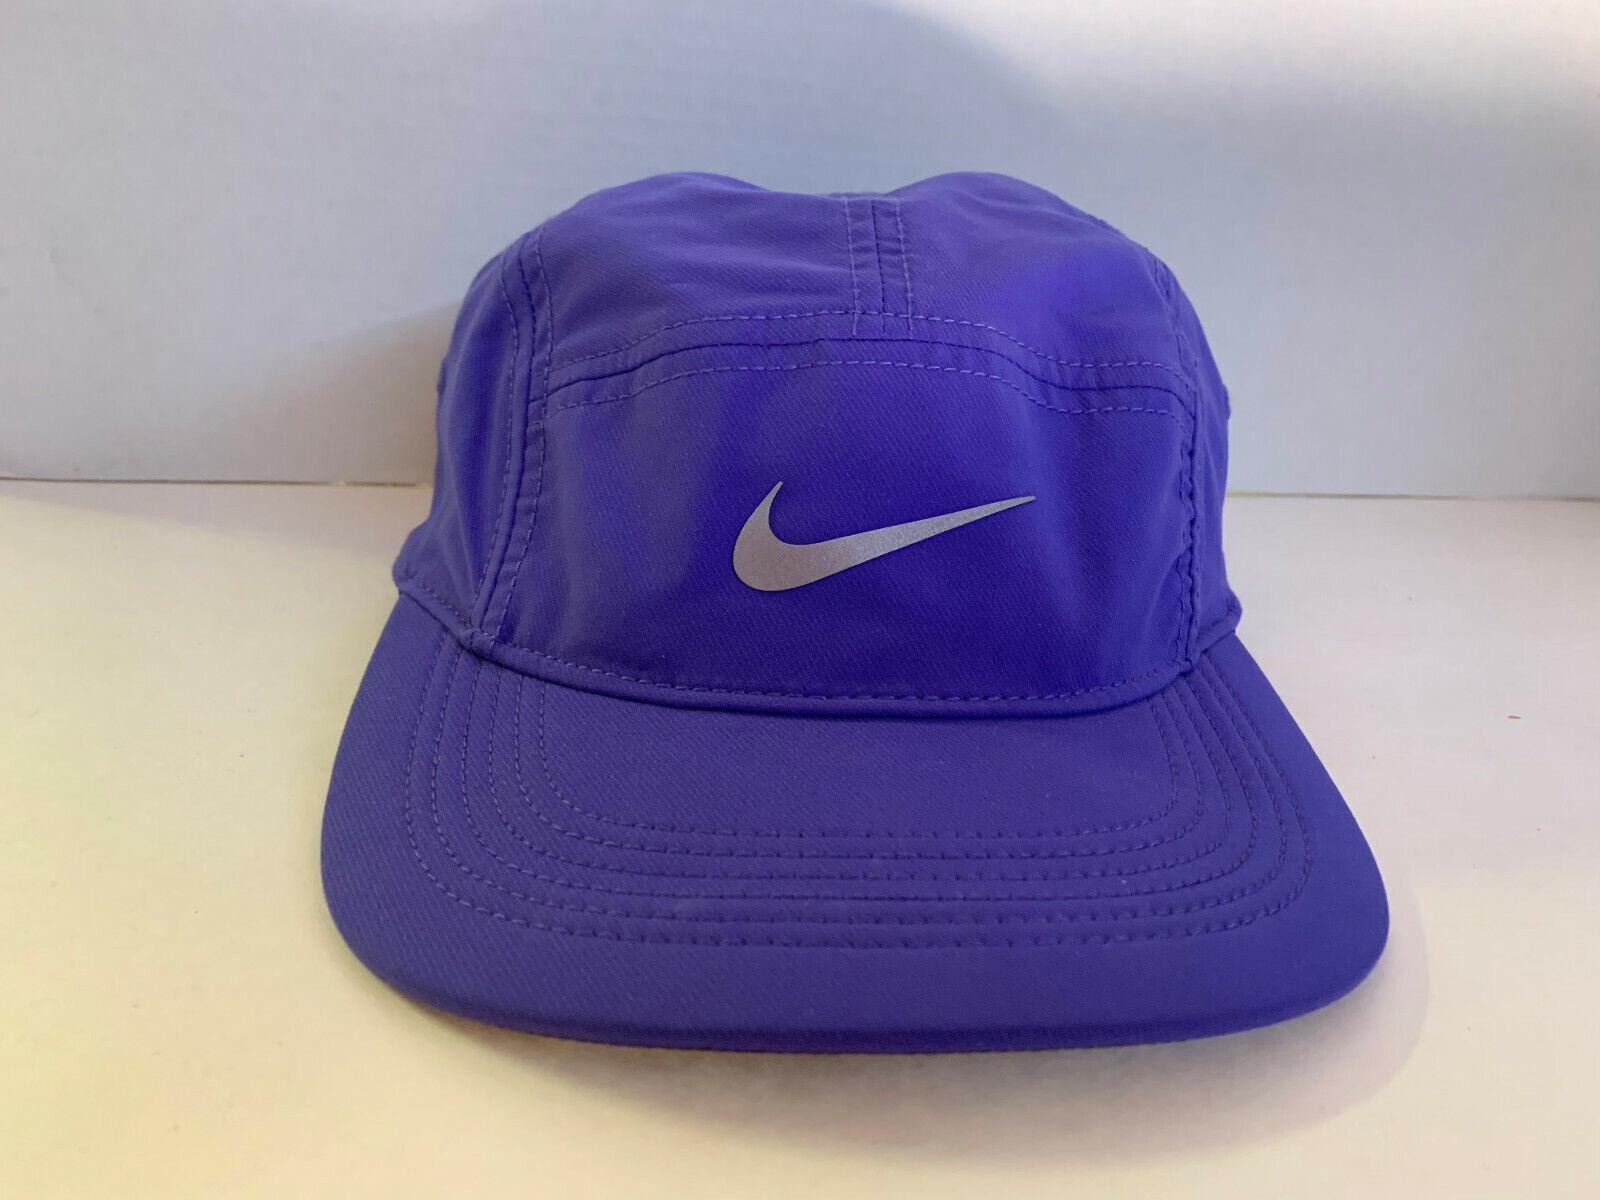 NEW  NIKE  Women's AW84 Dri-Fit Reflective Running Cap-Purple  save 50%-75%off